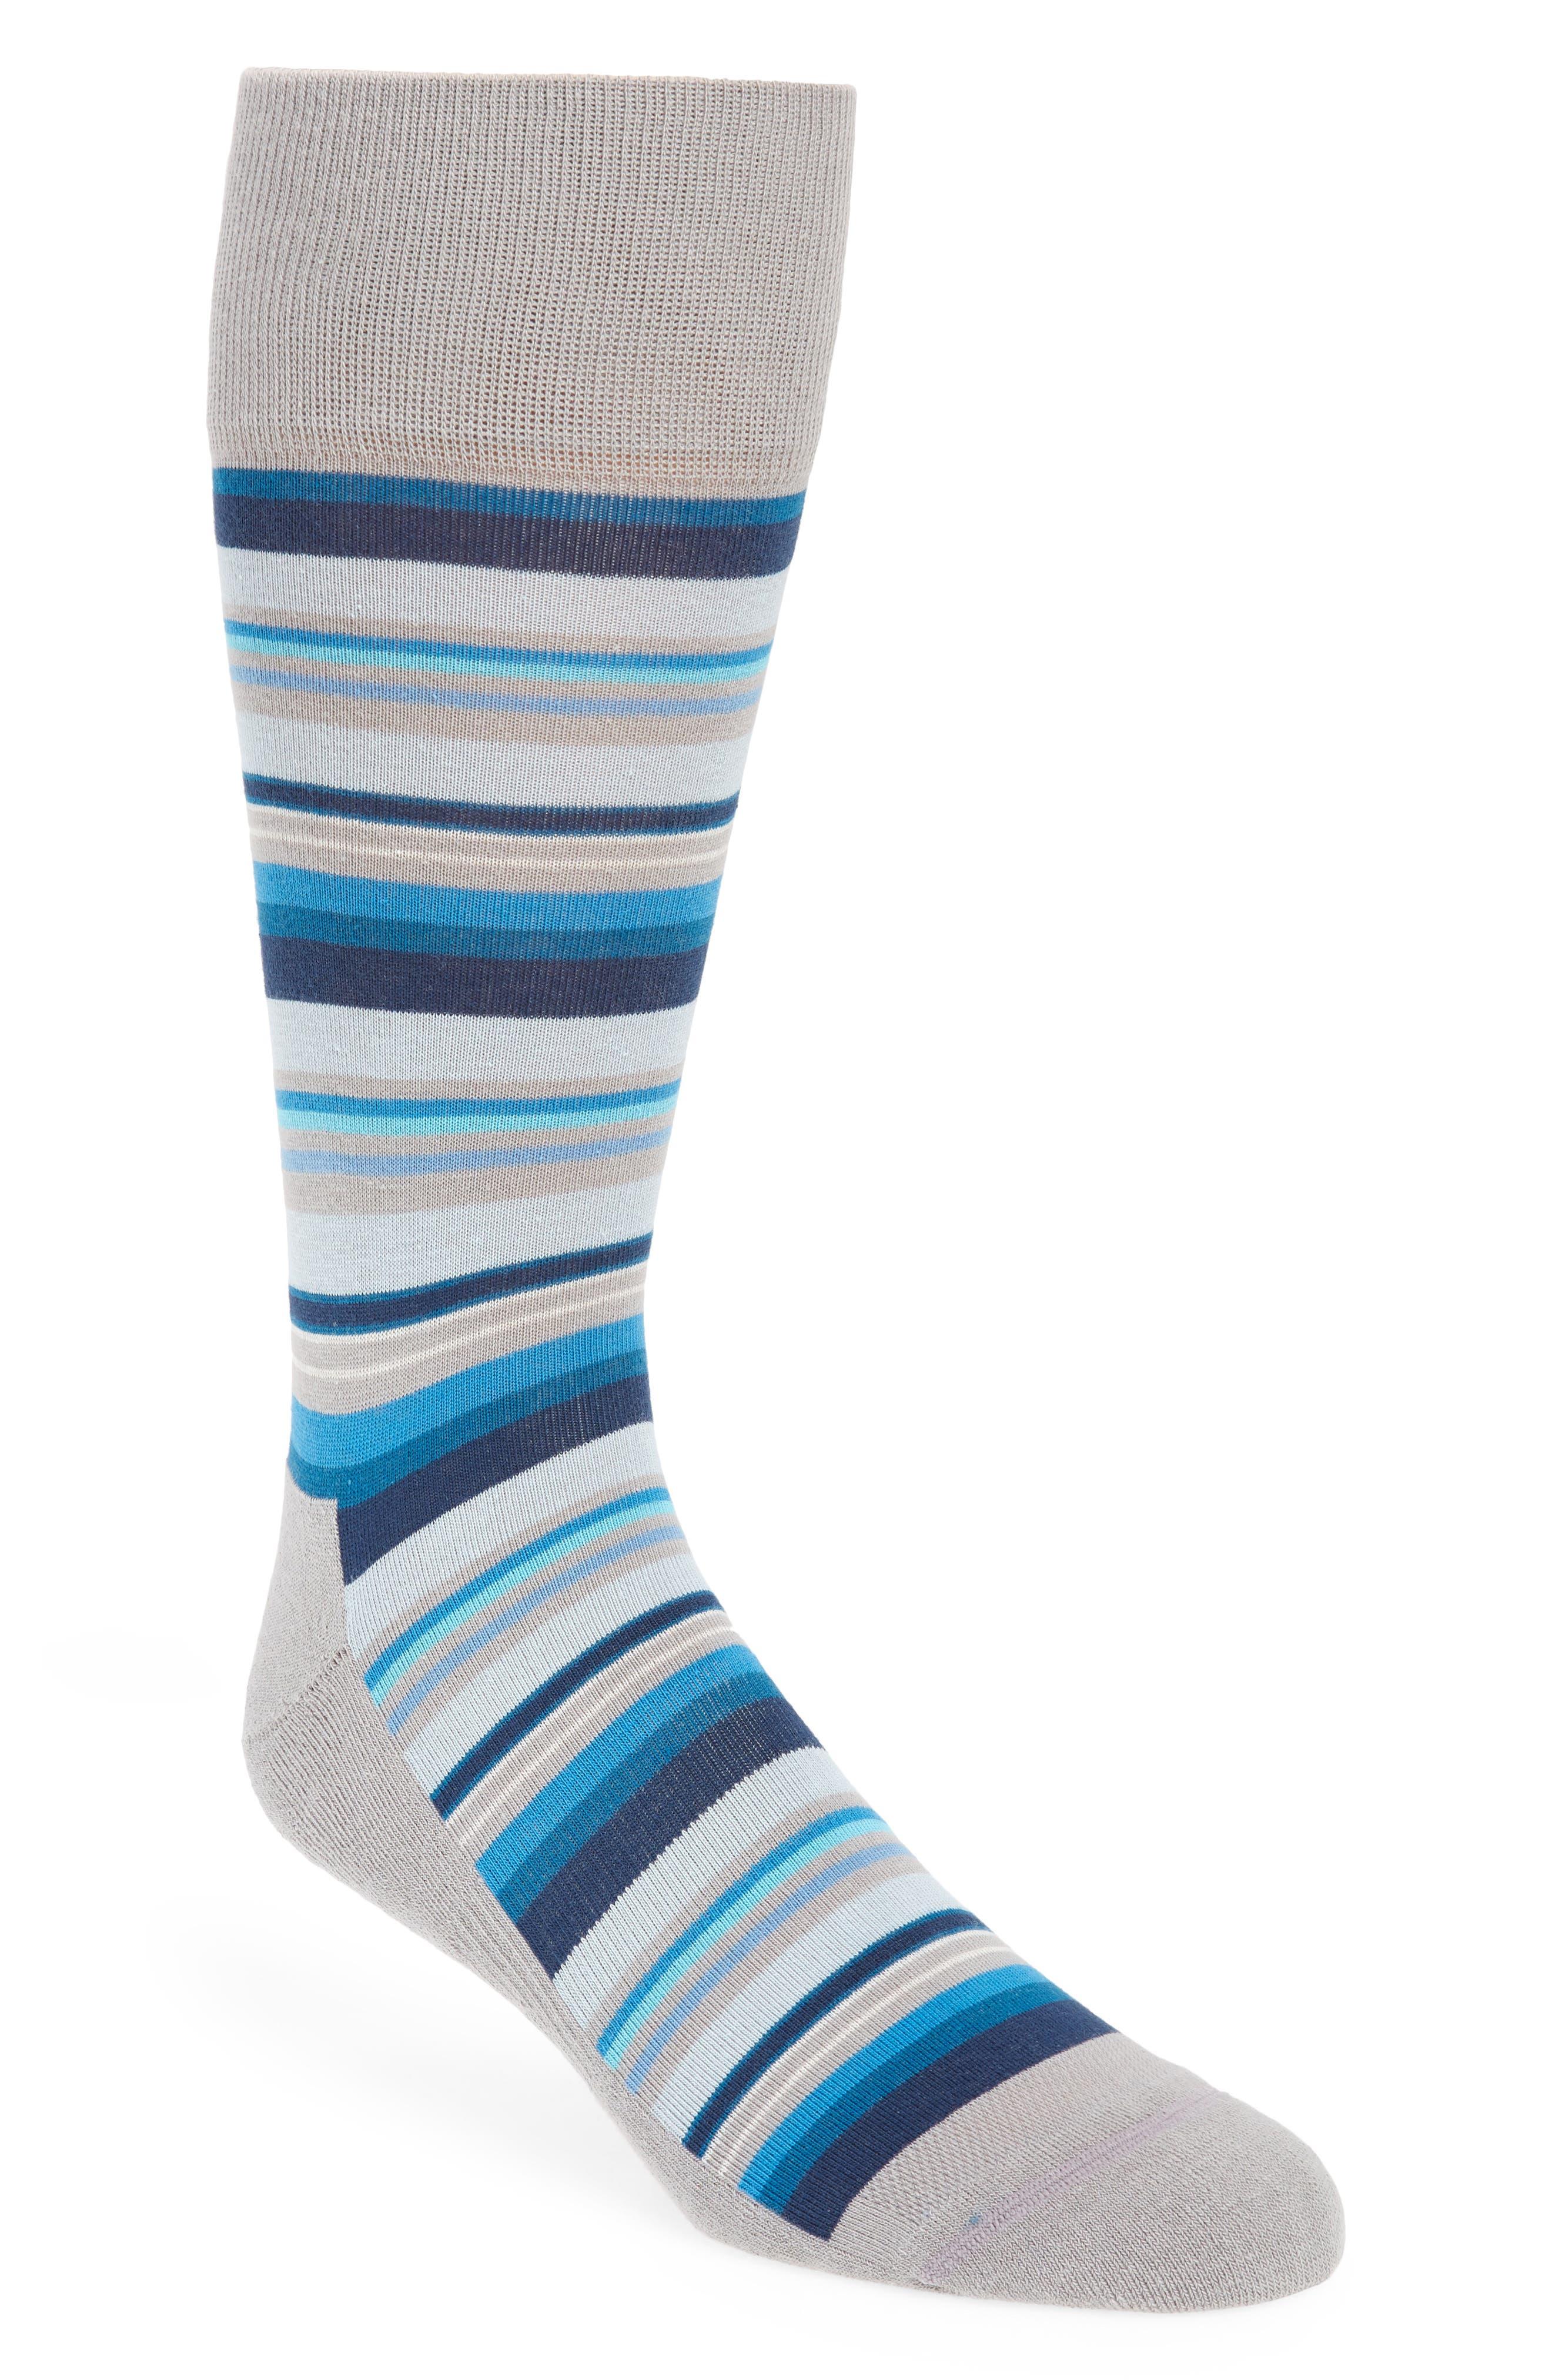 Variegated Stripe Socks,                             Main thumbnail 1, color,                             030